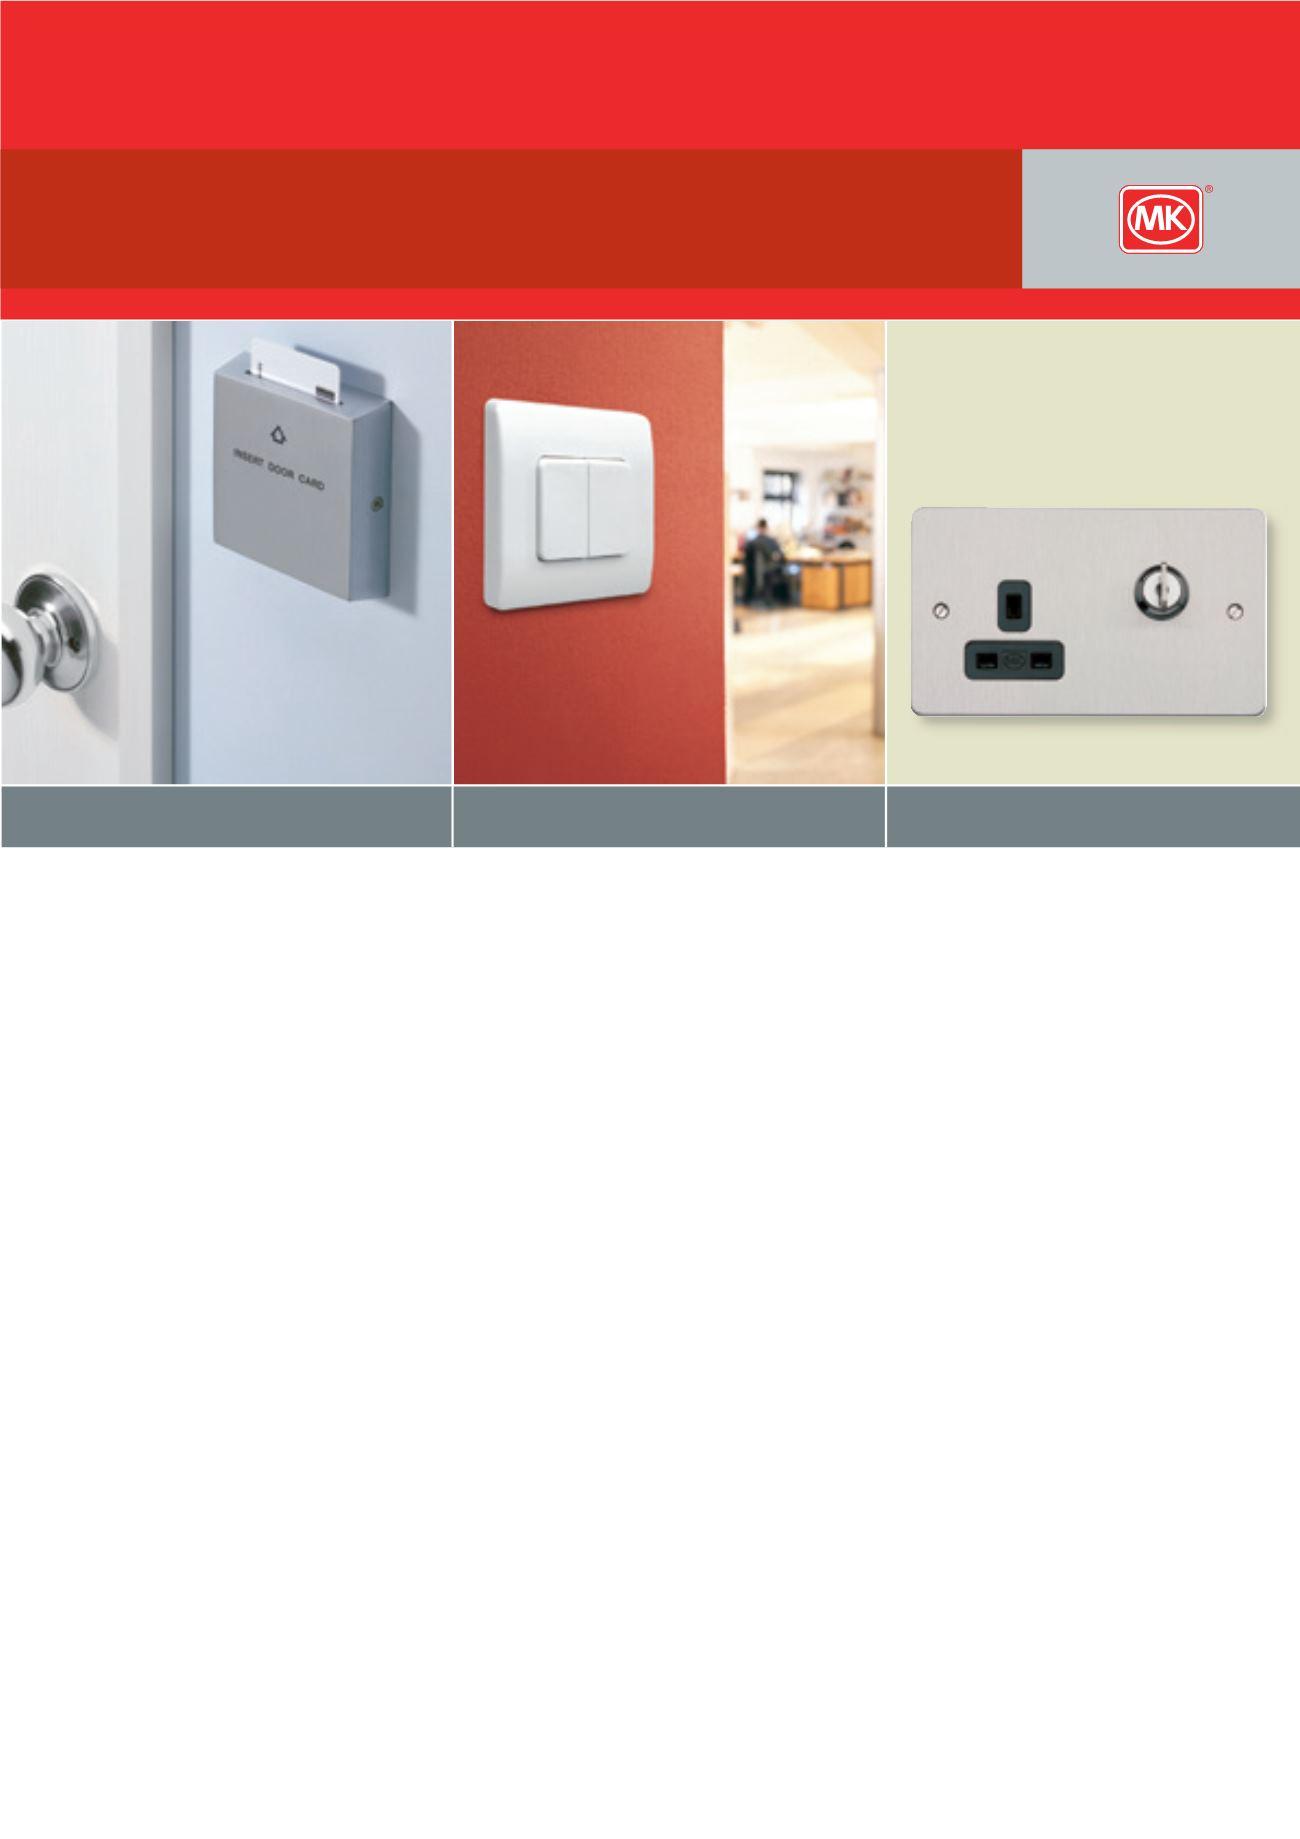 Outstanding Mk Wiring Devices Range Brochures Wiring Digital Resources Antuskbiperorg